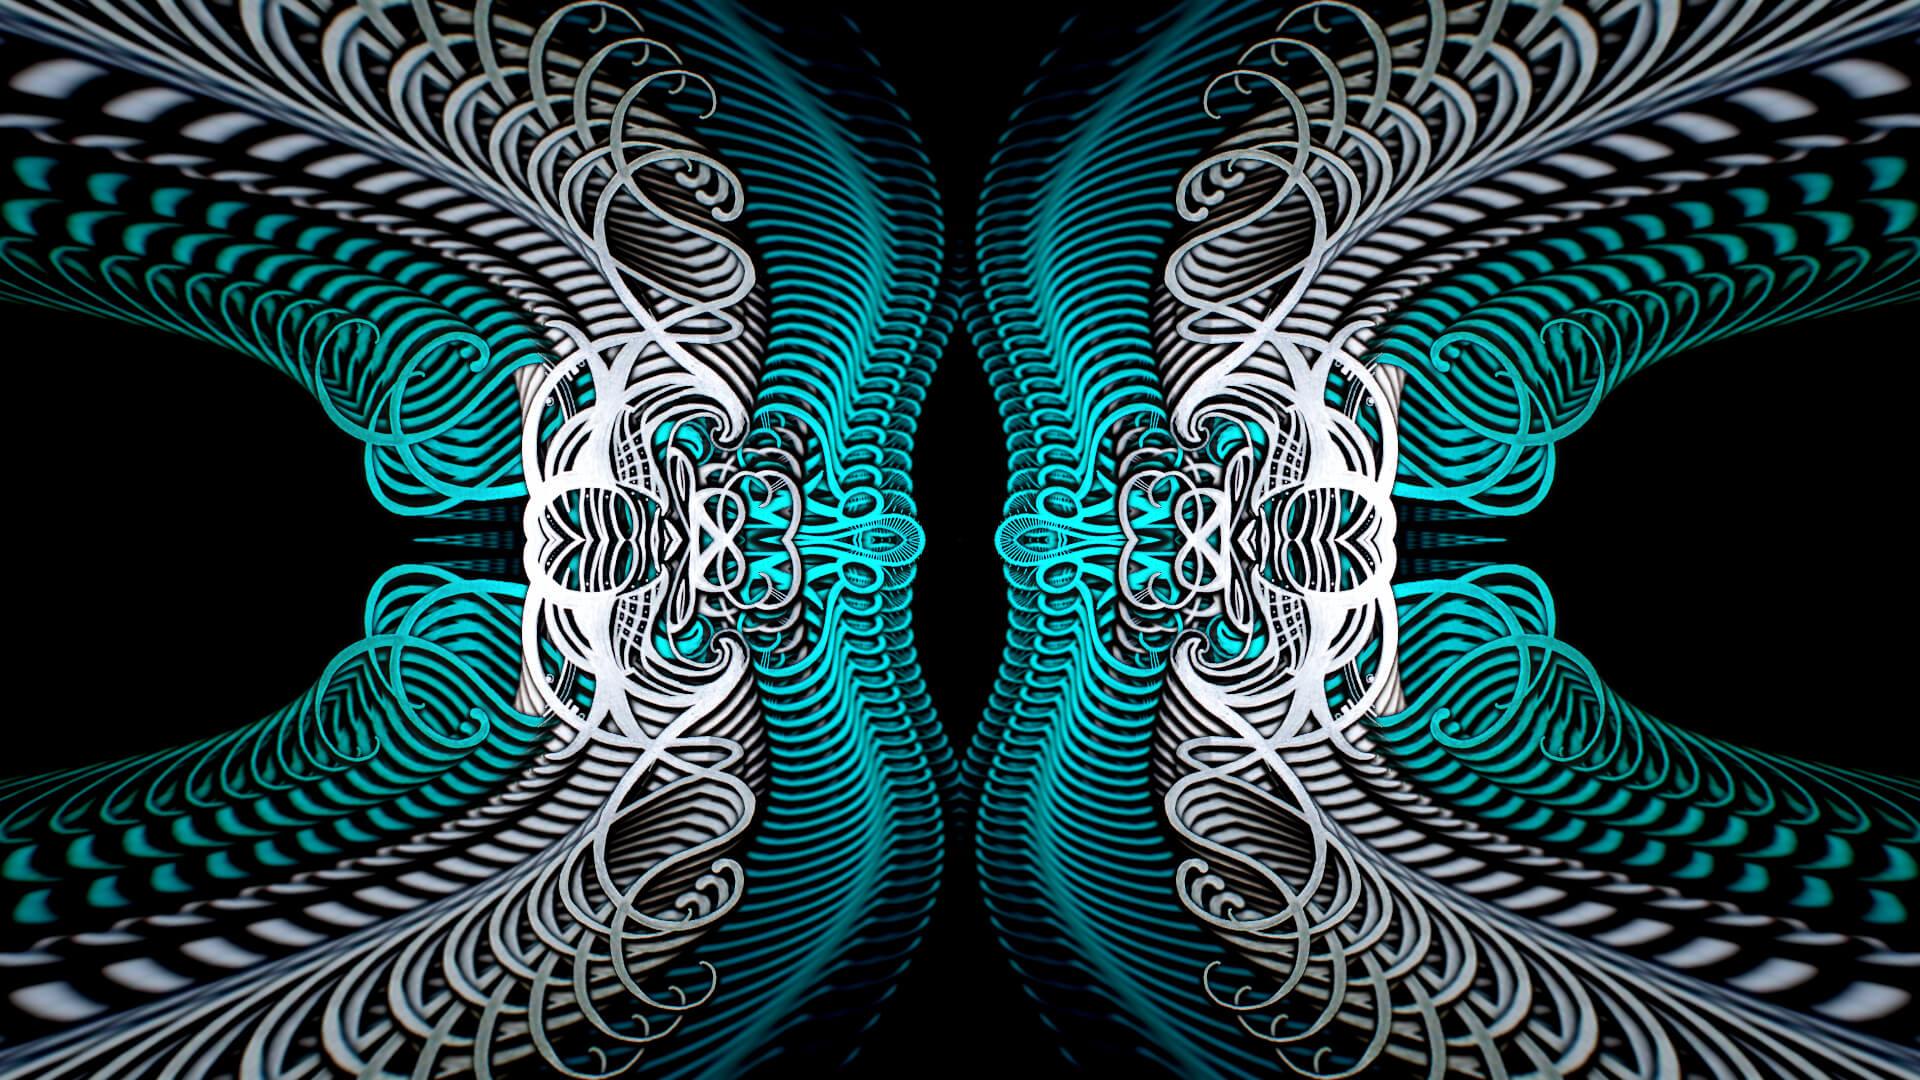 Down through all eternity - digital abstract art by Mitek